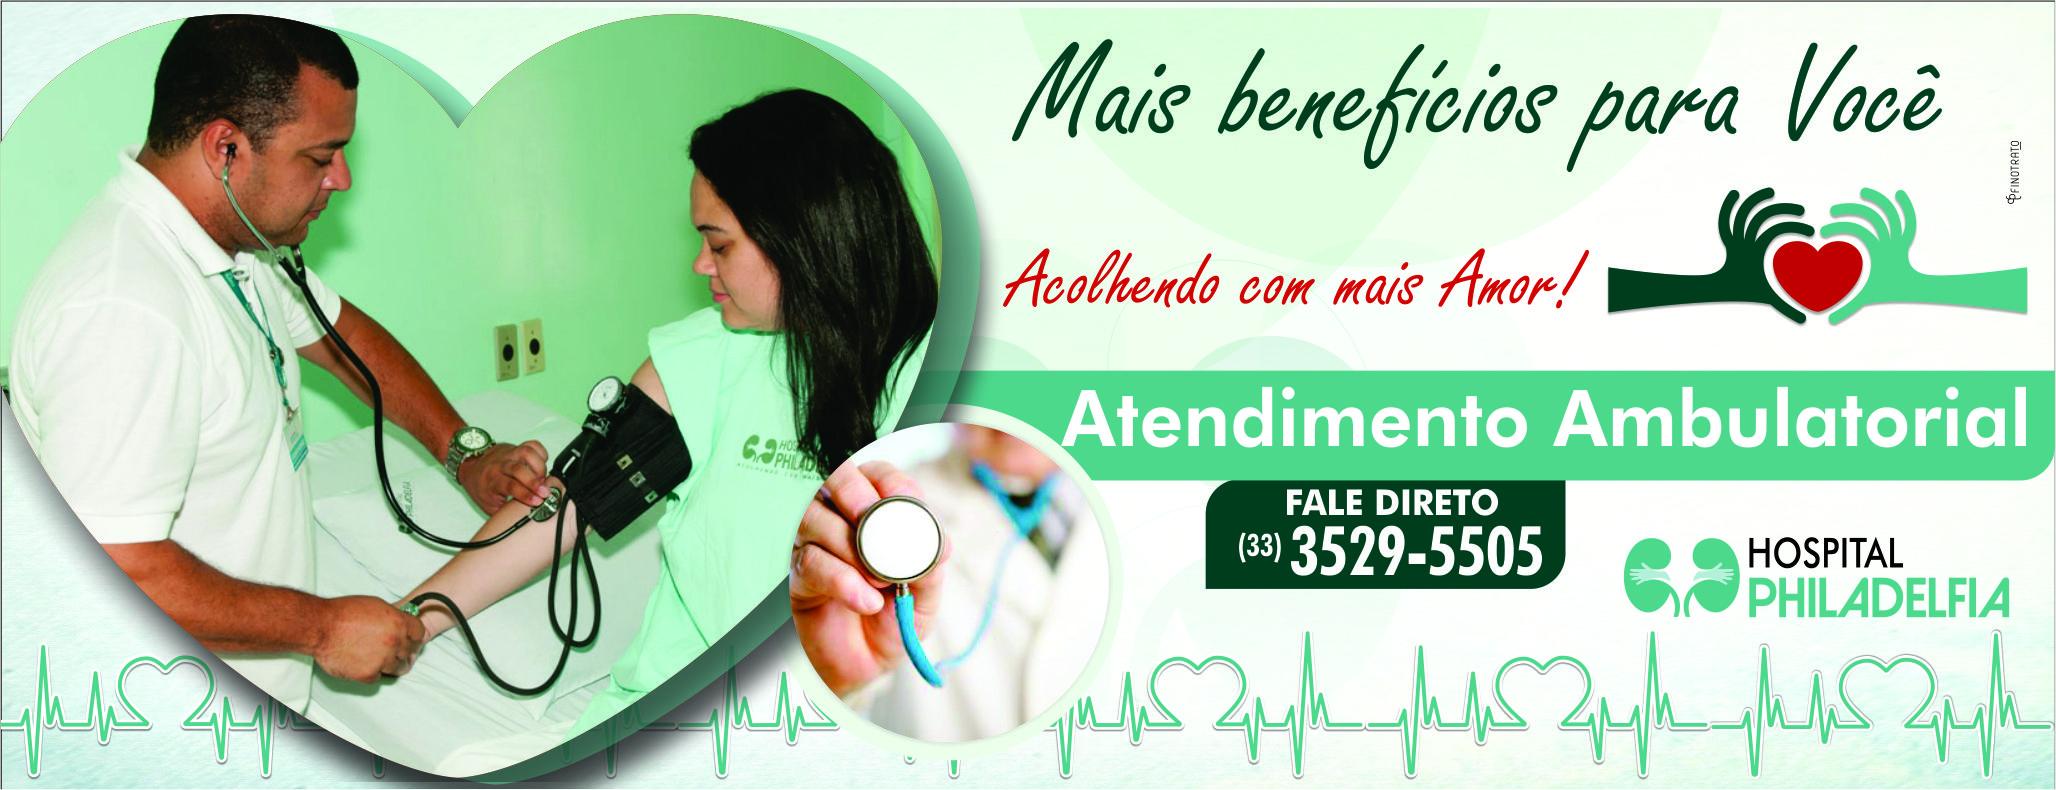 banner site atendimento ambulatorial hospital